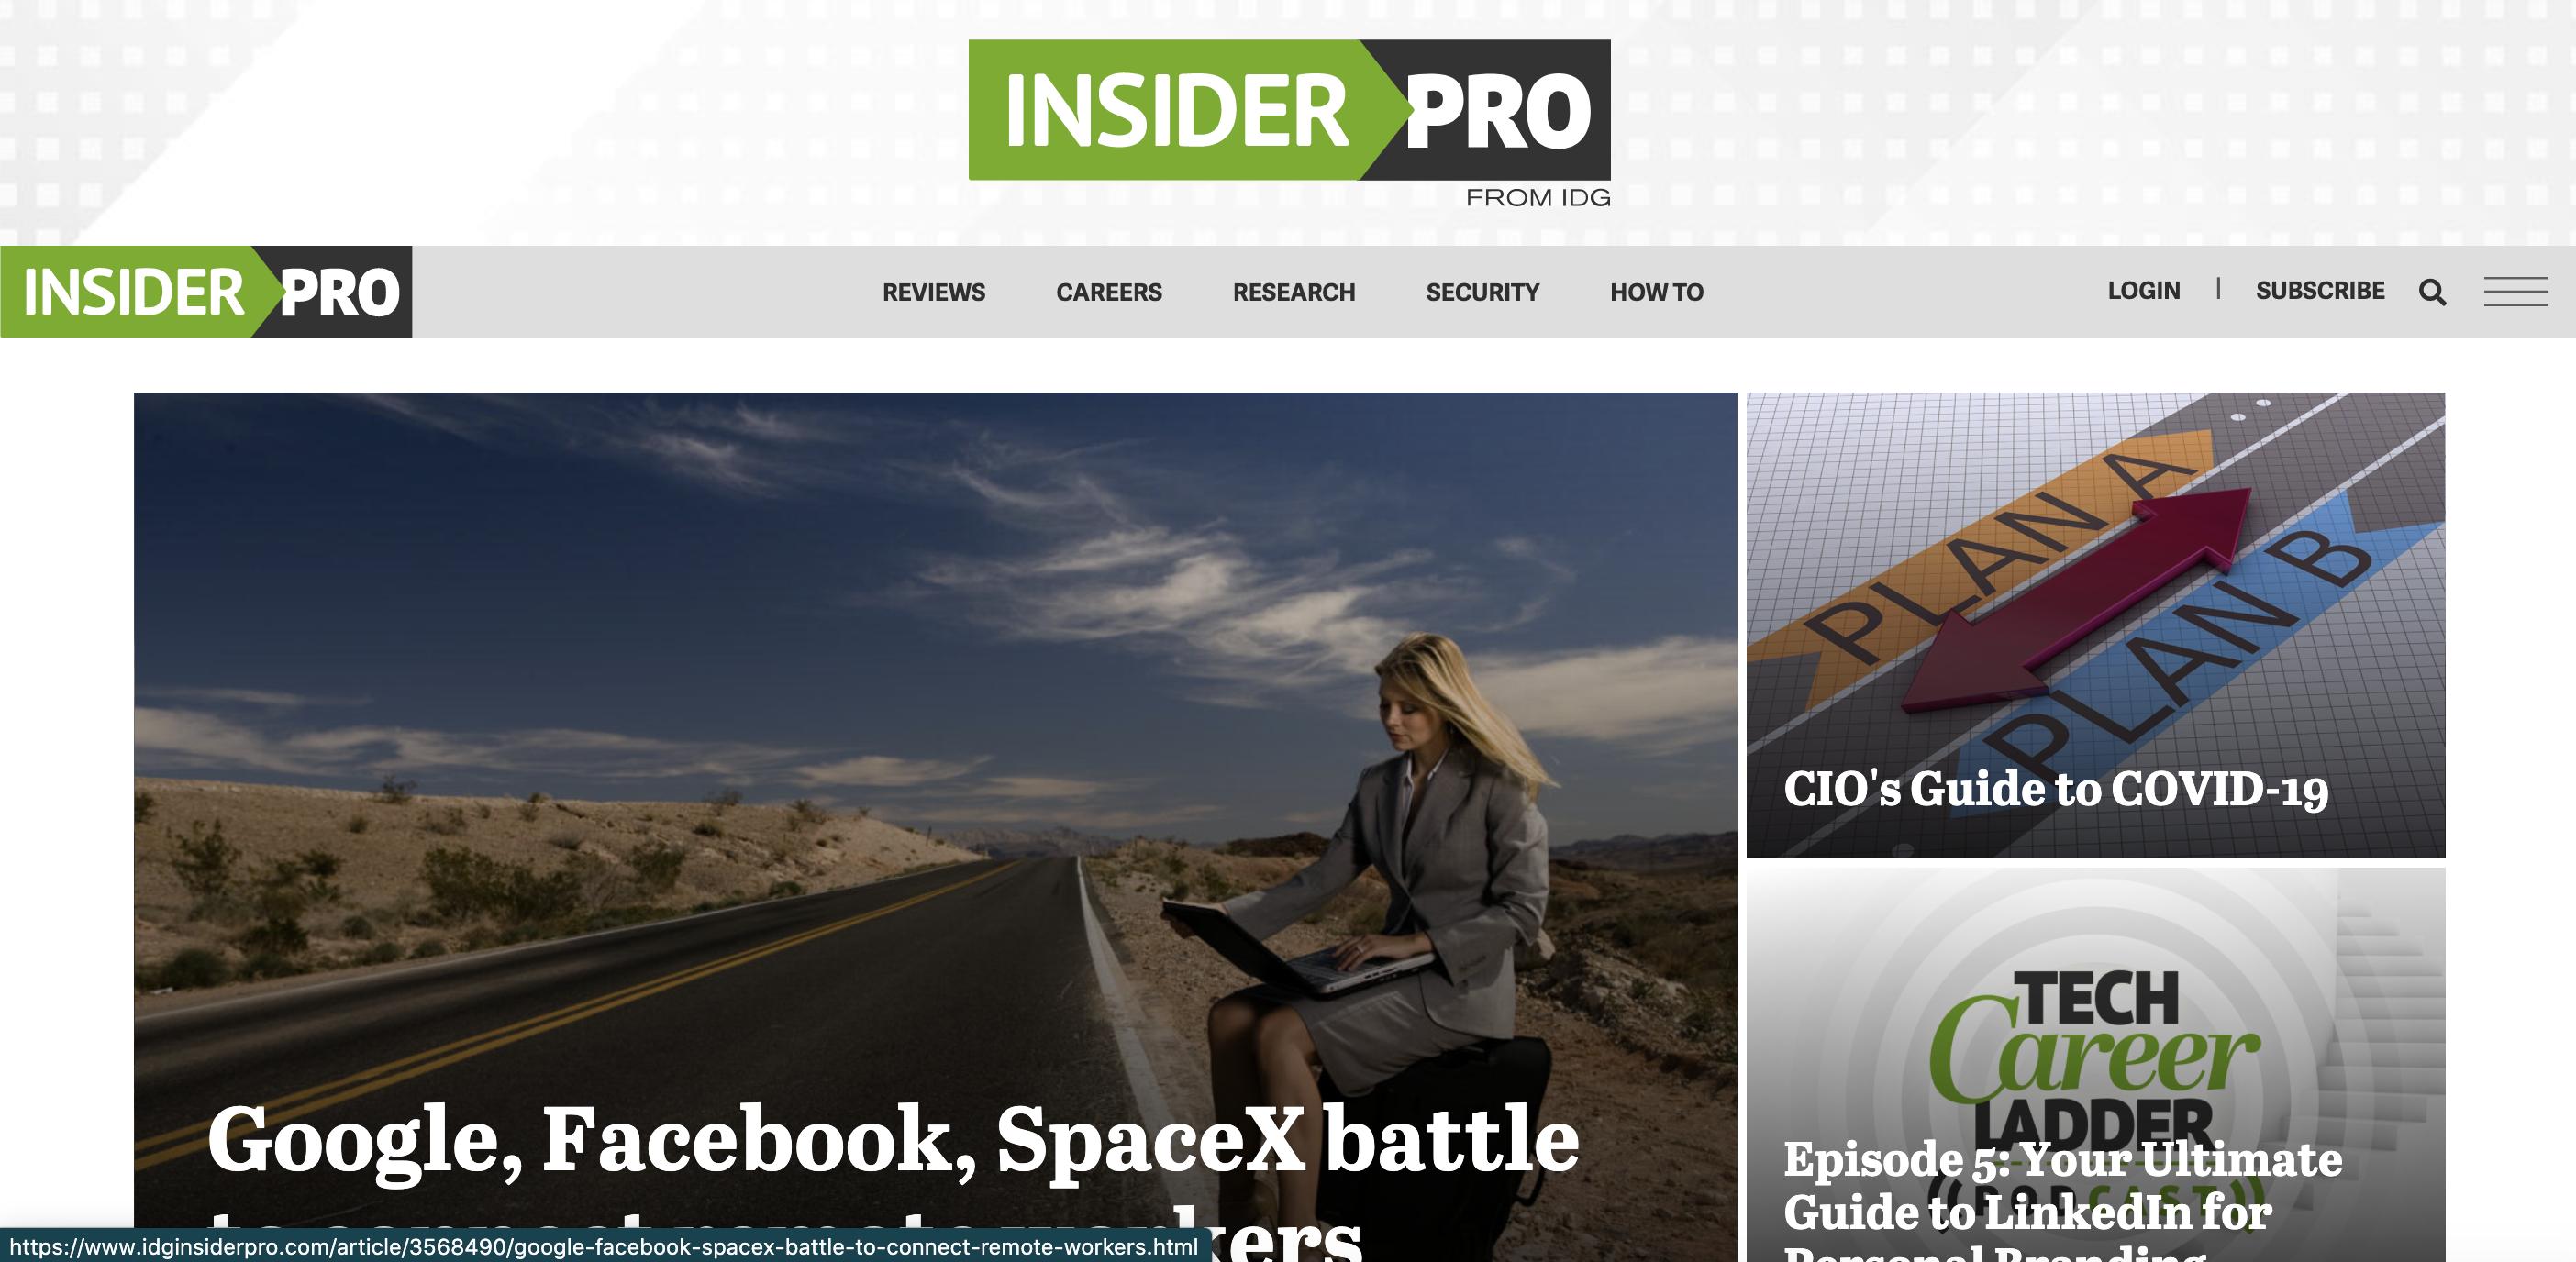 Screenshot of the top of IDG's InsiderPro homepage